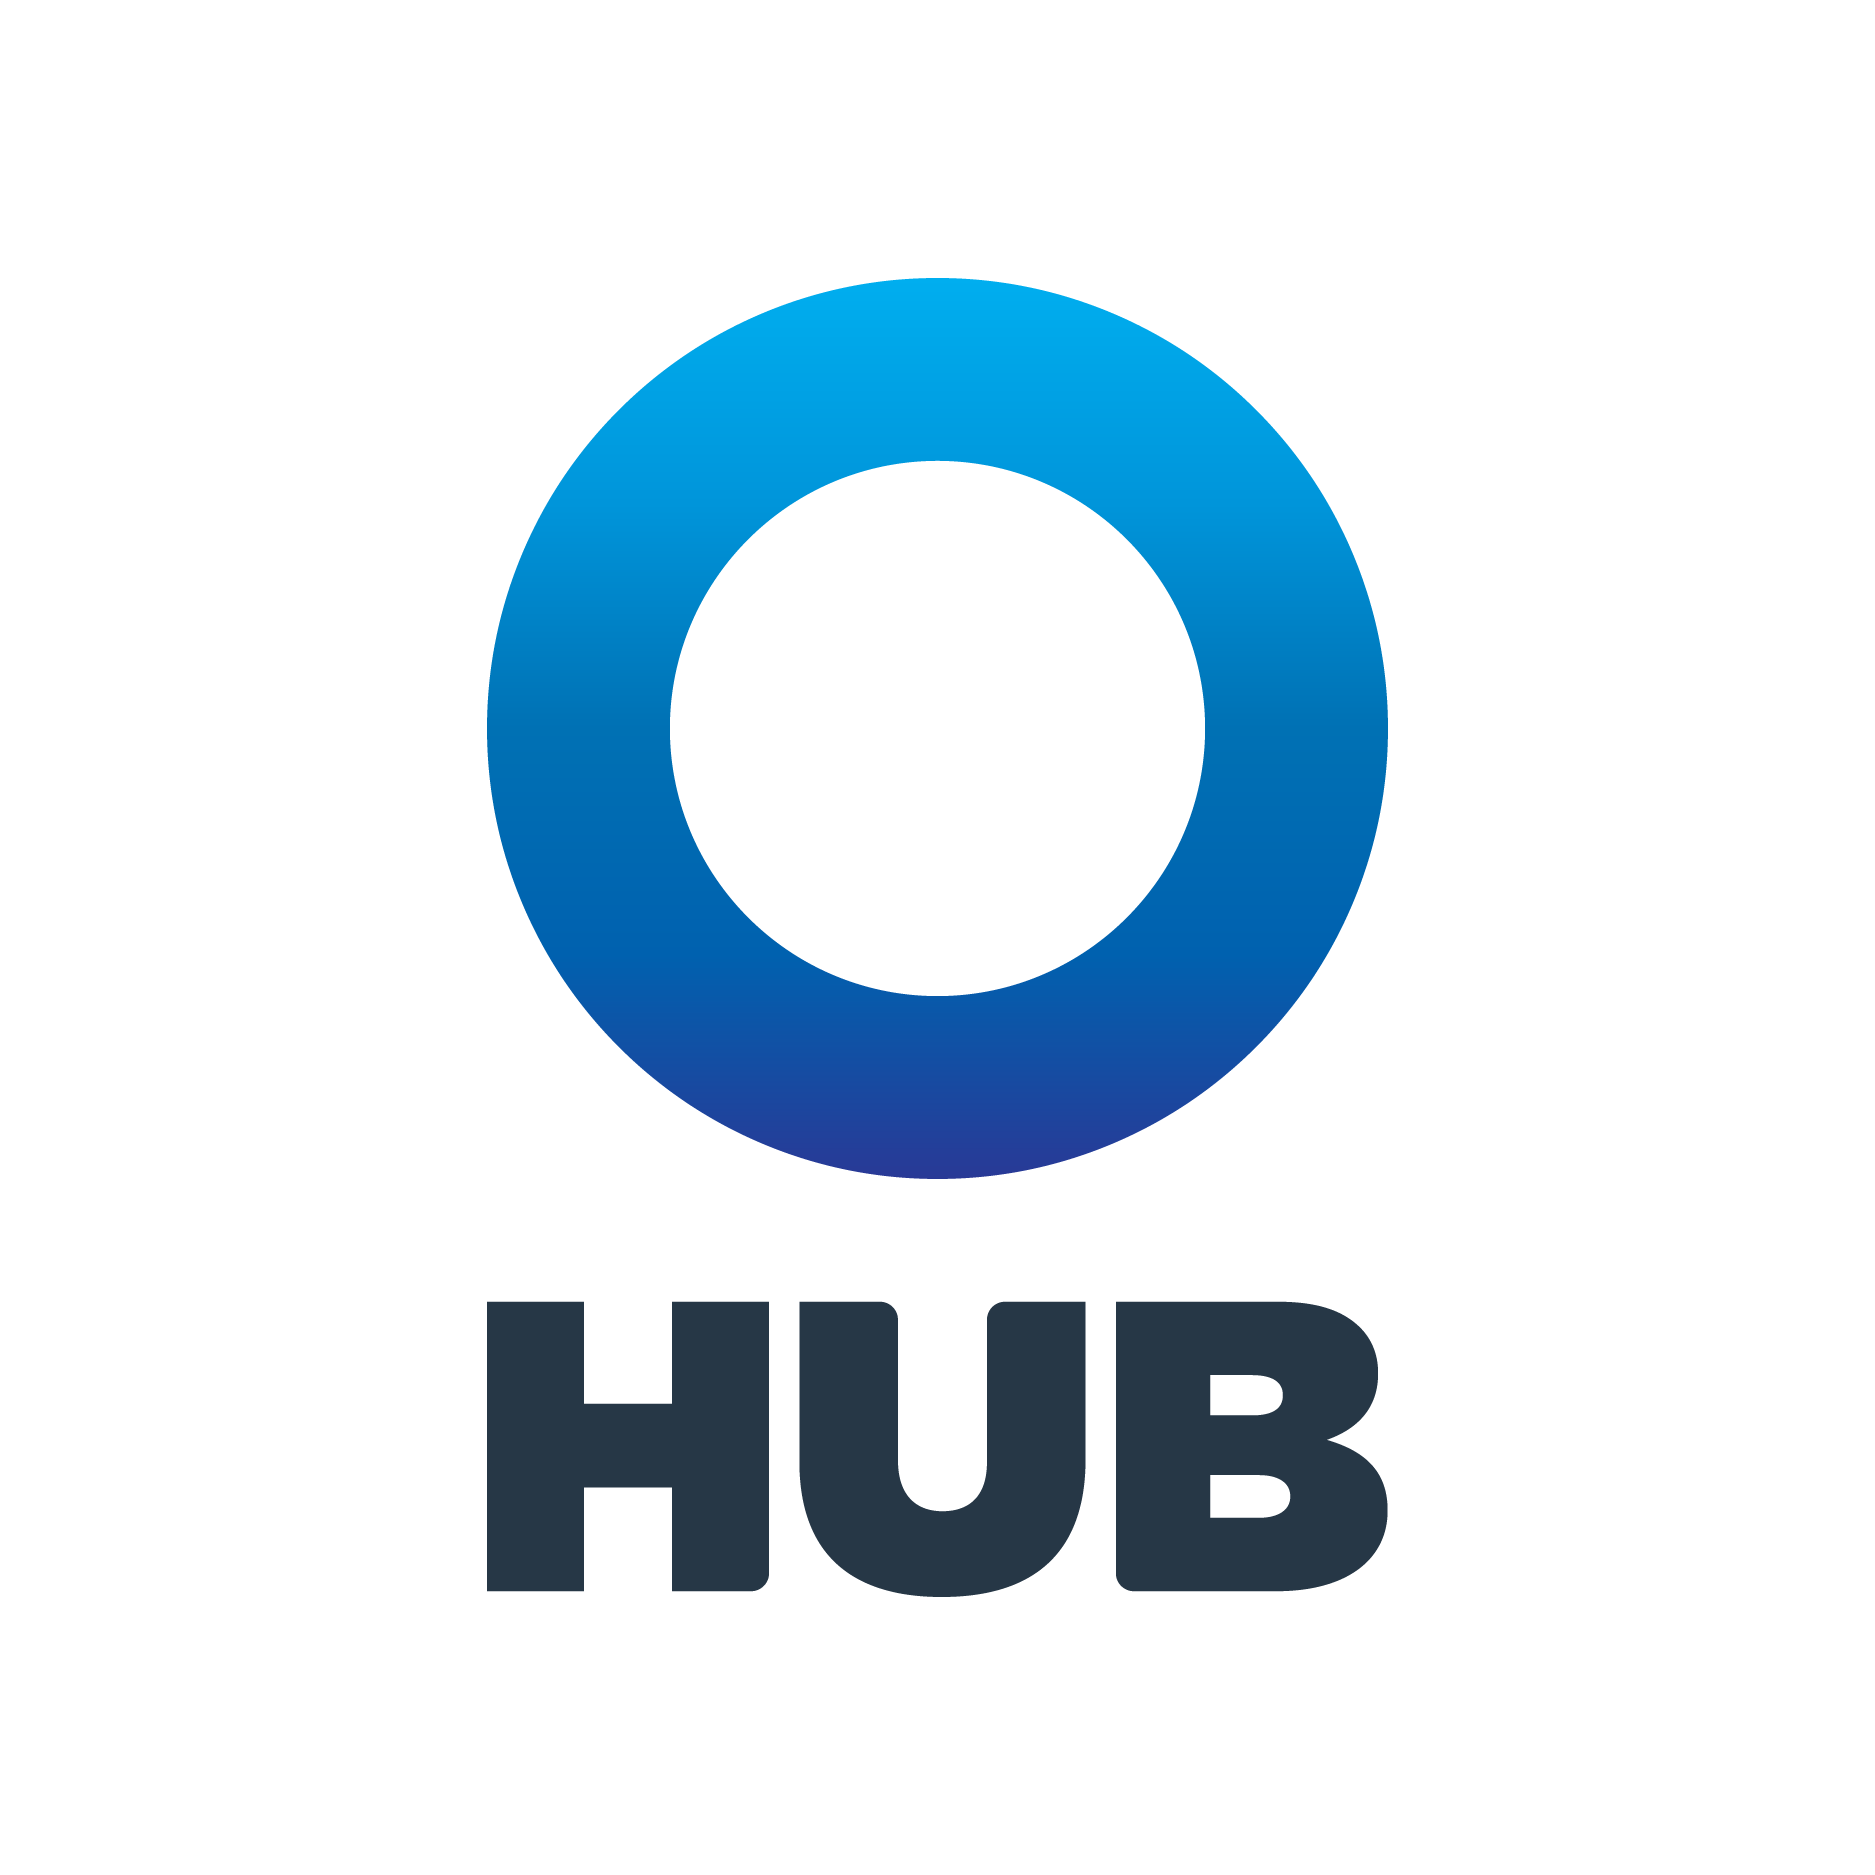 HUB-Vertical-Full-Colour-RGB-01